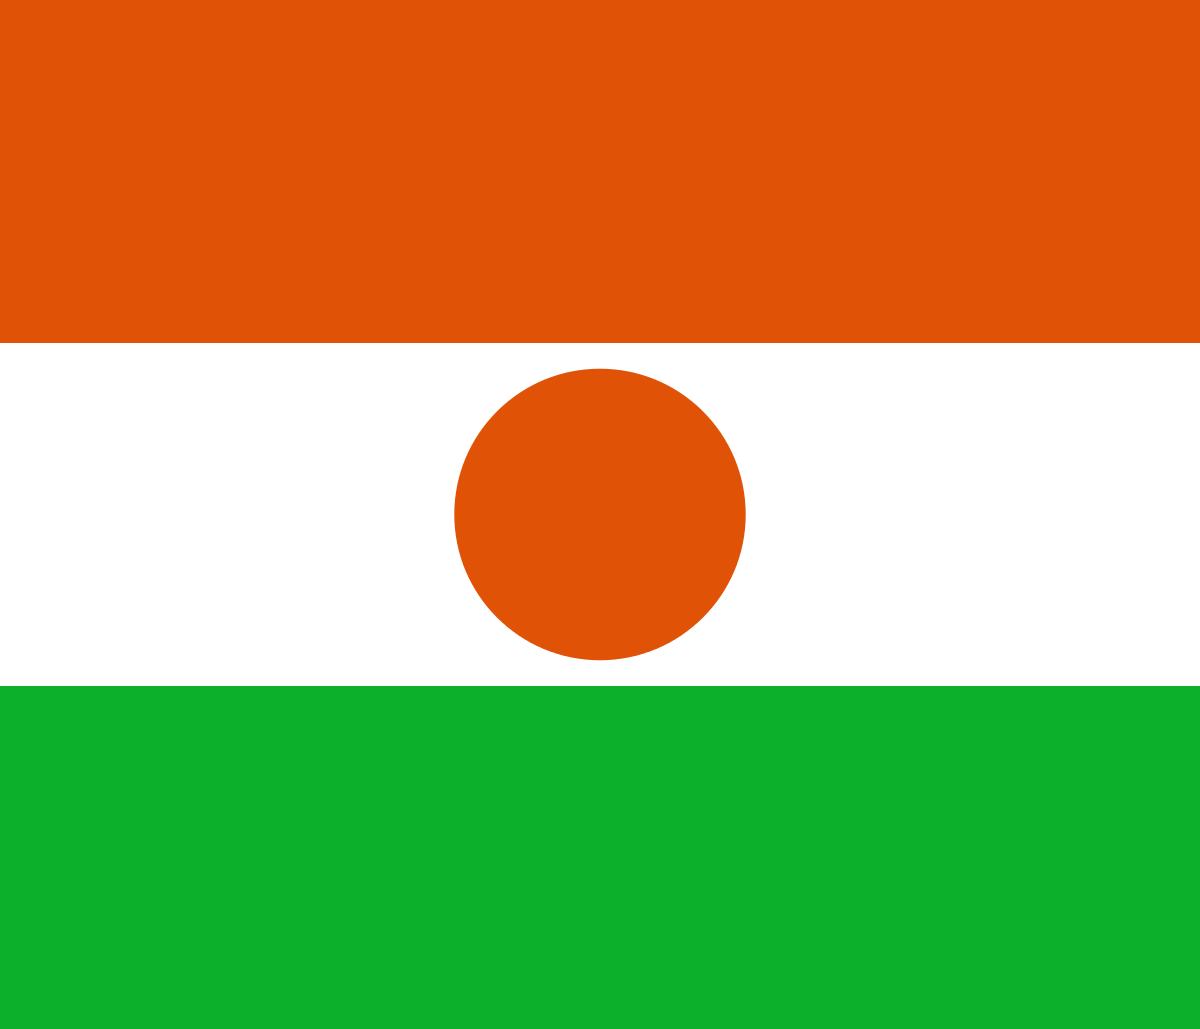 Travcour Visa & Legalisation Services Limited Niger Visa Application